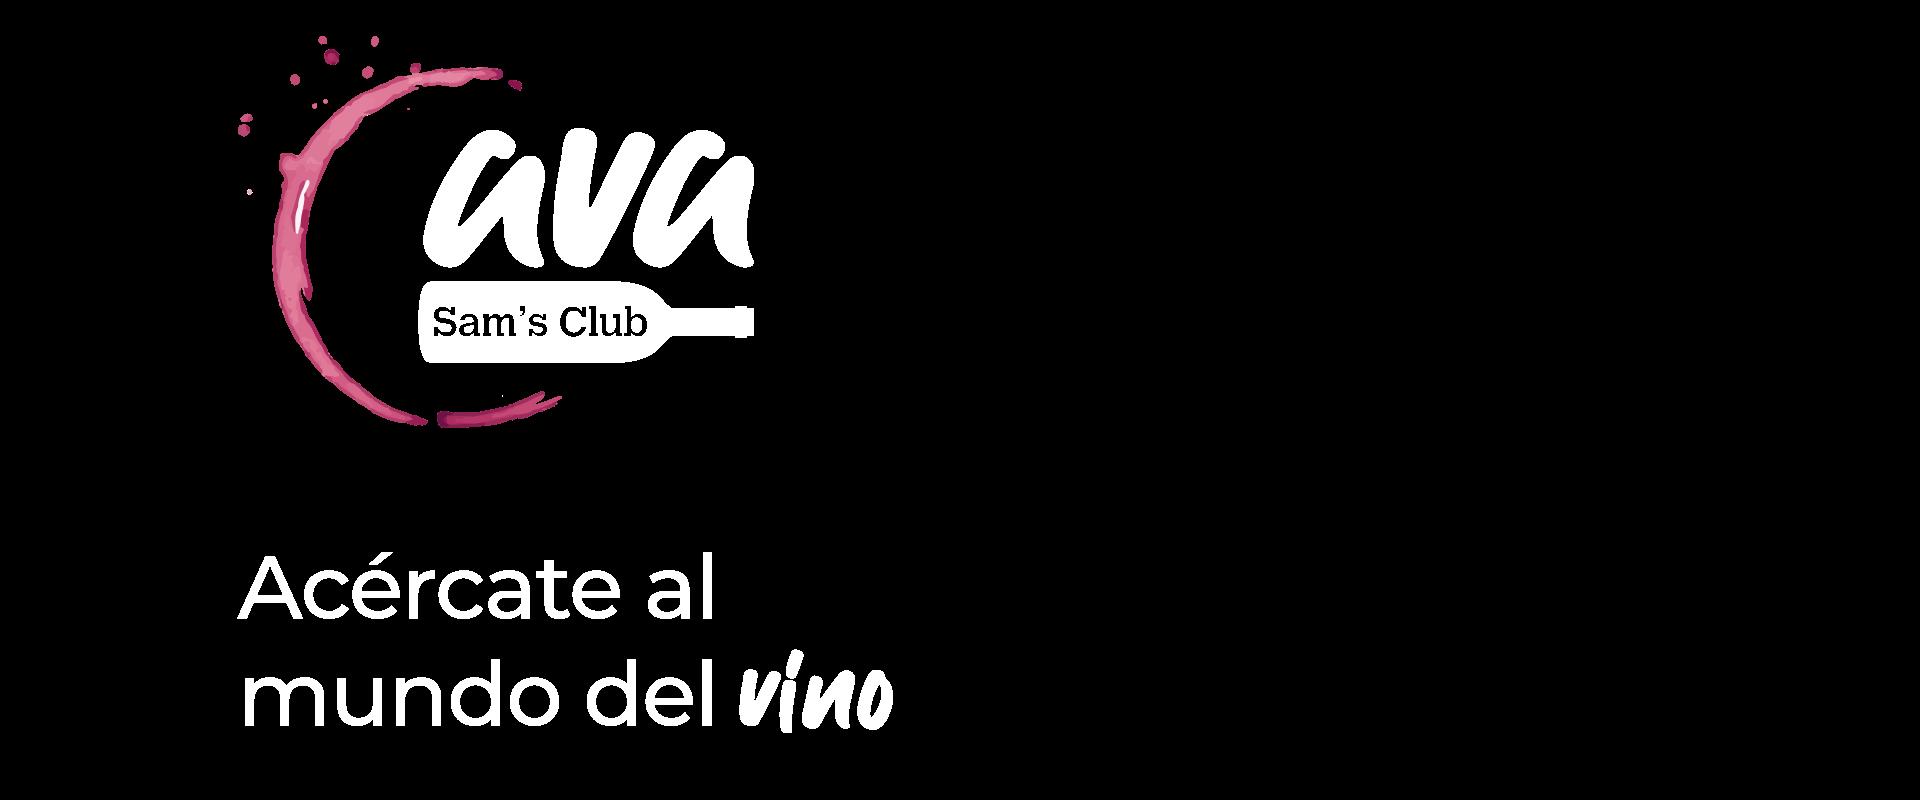 Conoce la Cava Sam's Club y acércate al mundo del vino